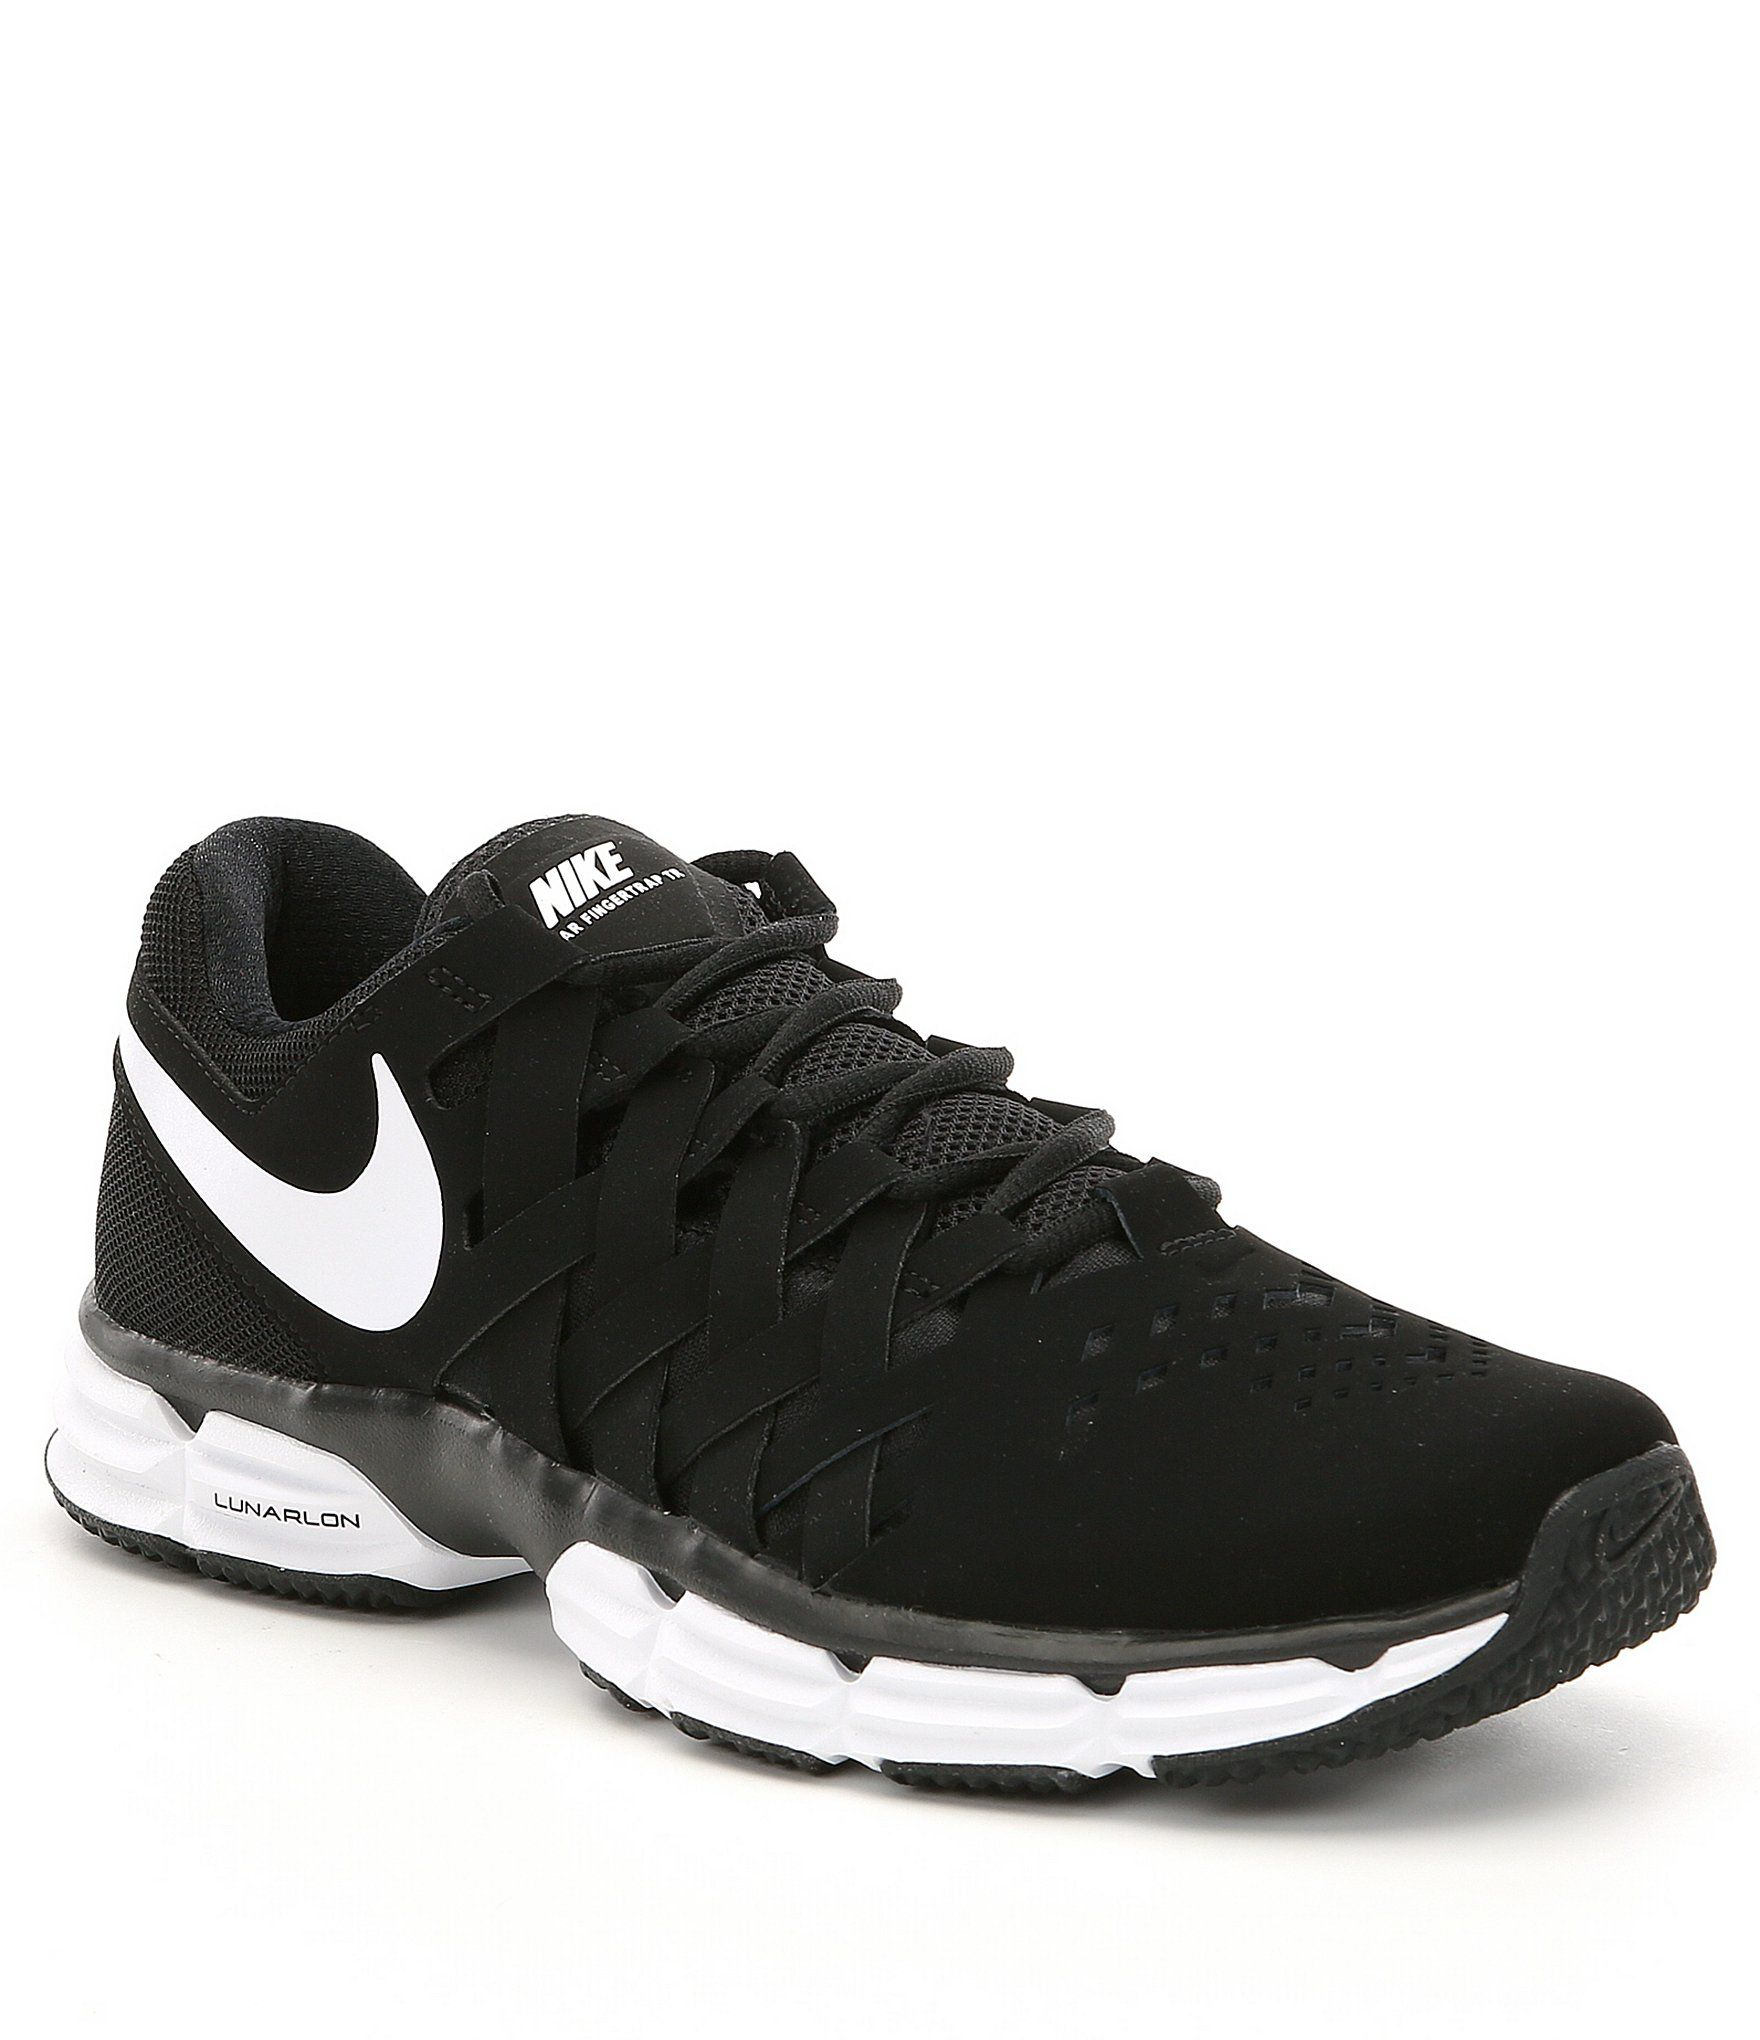 Nike Men's Lunar Fingertrap Training Shoes in 2020 | Nike